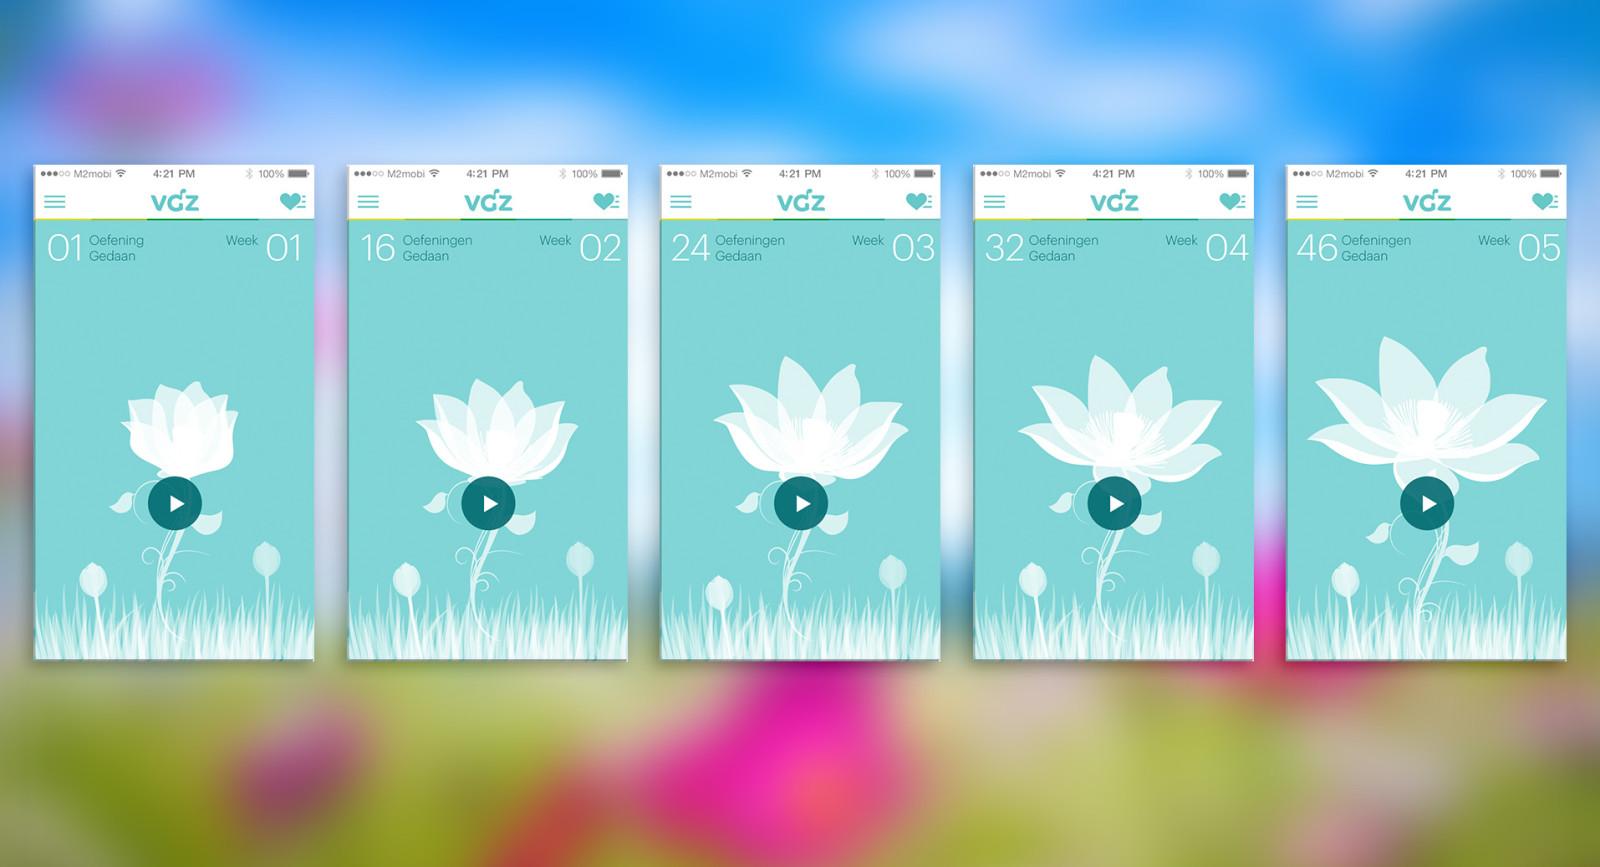 VGZ mindfulness coach - flower progress